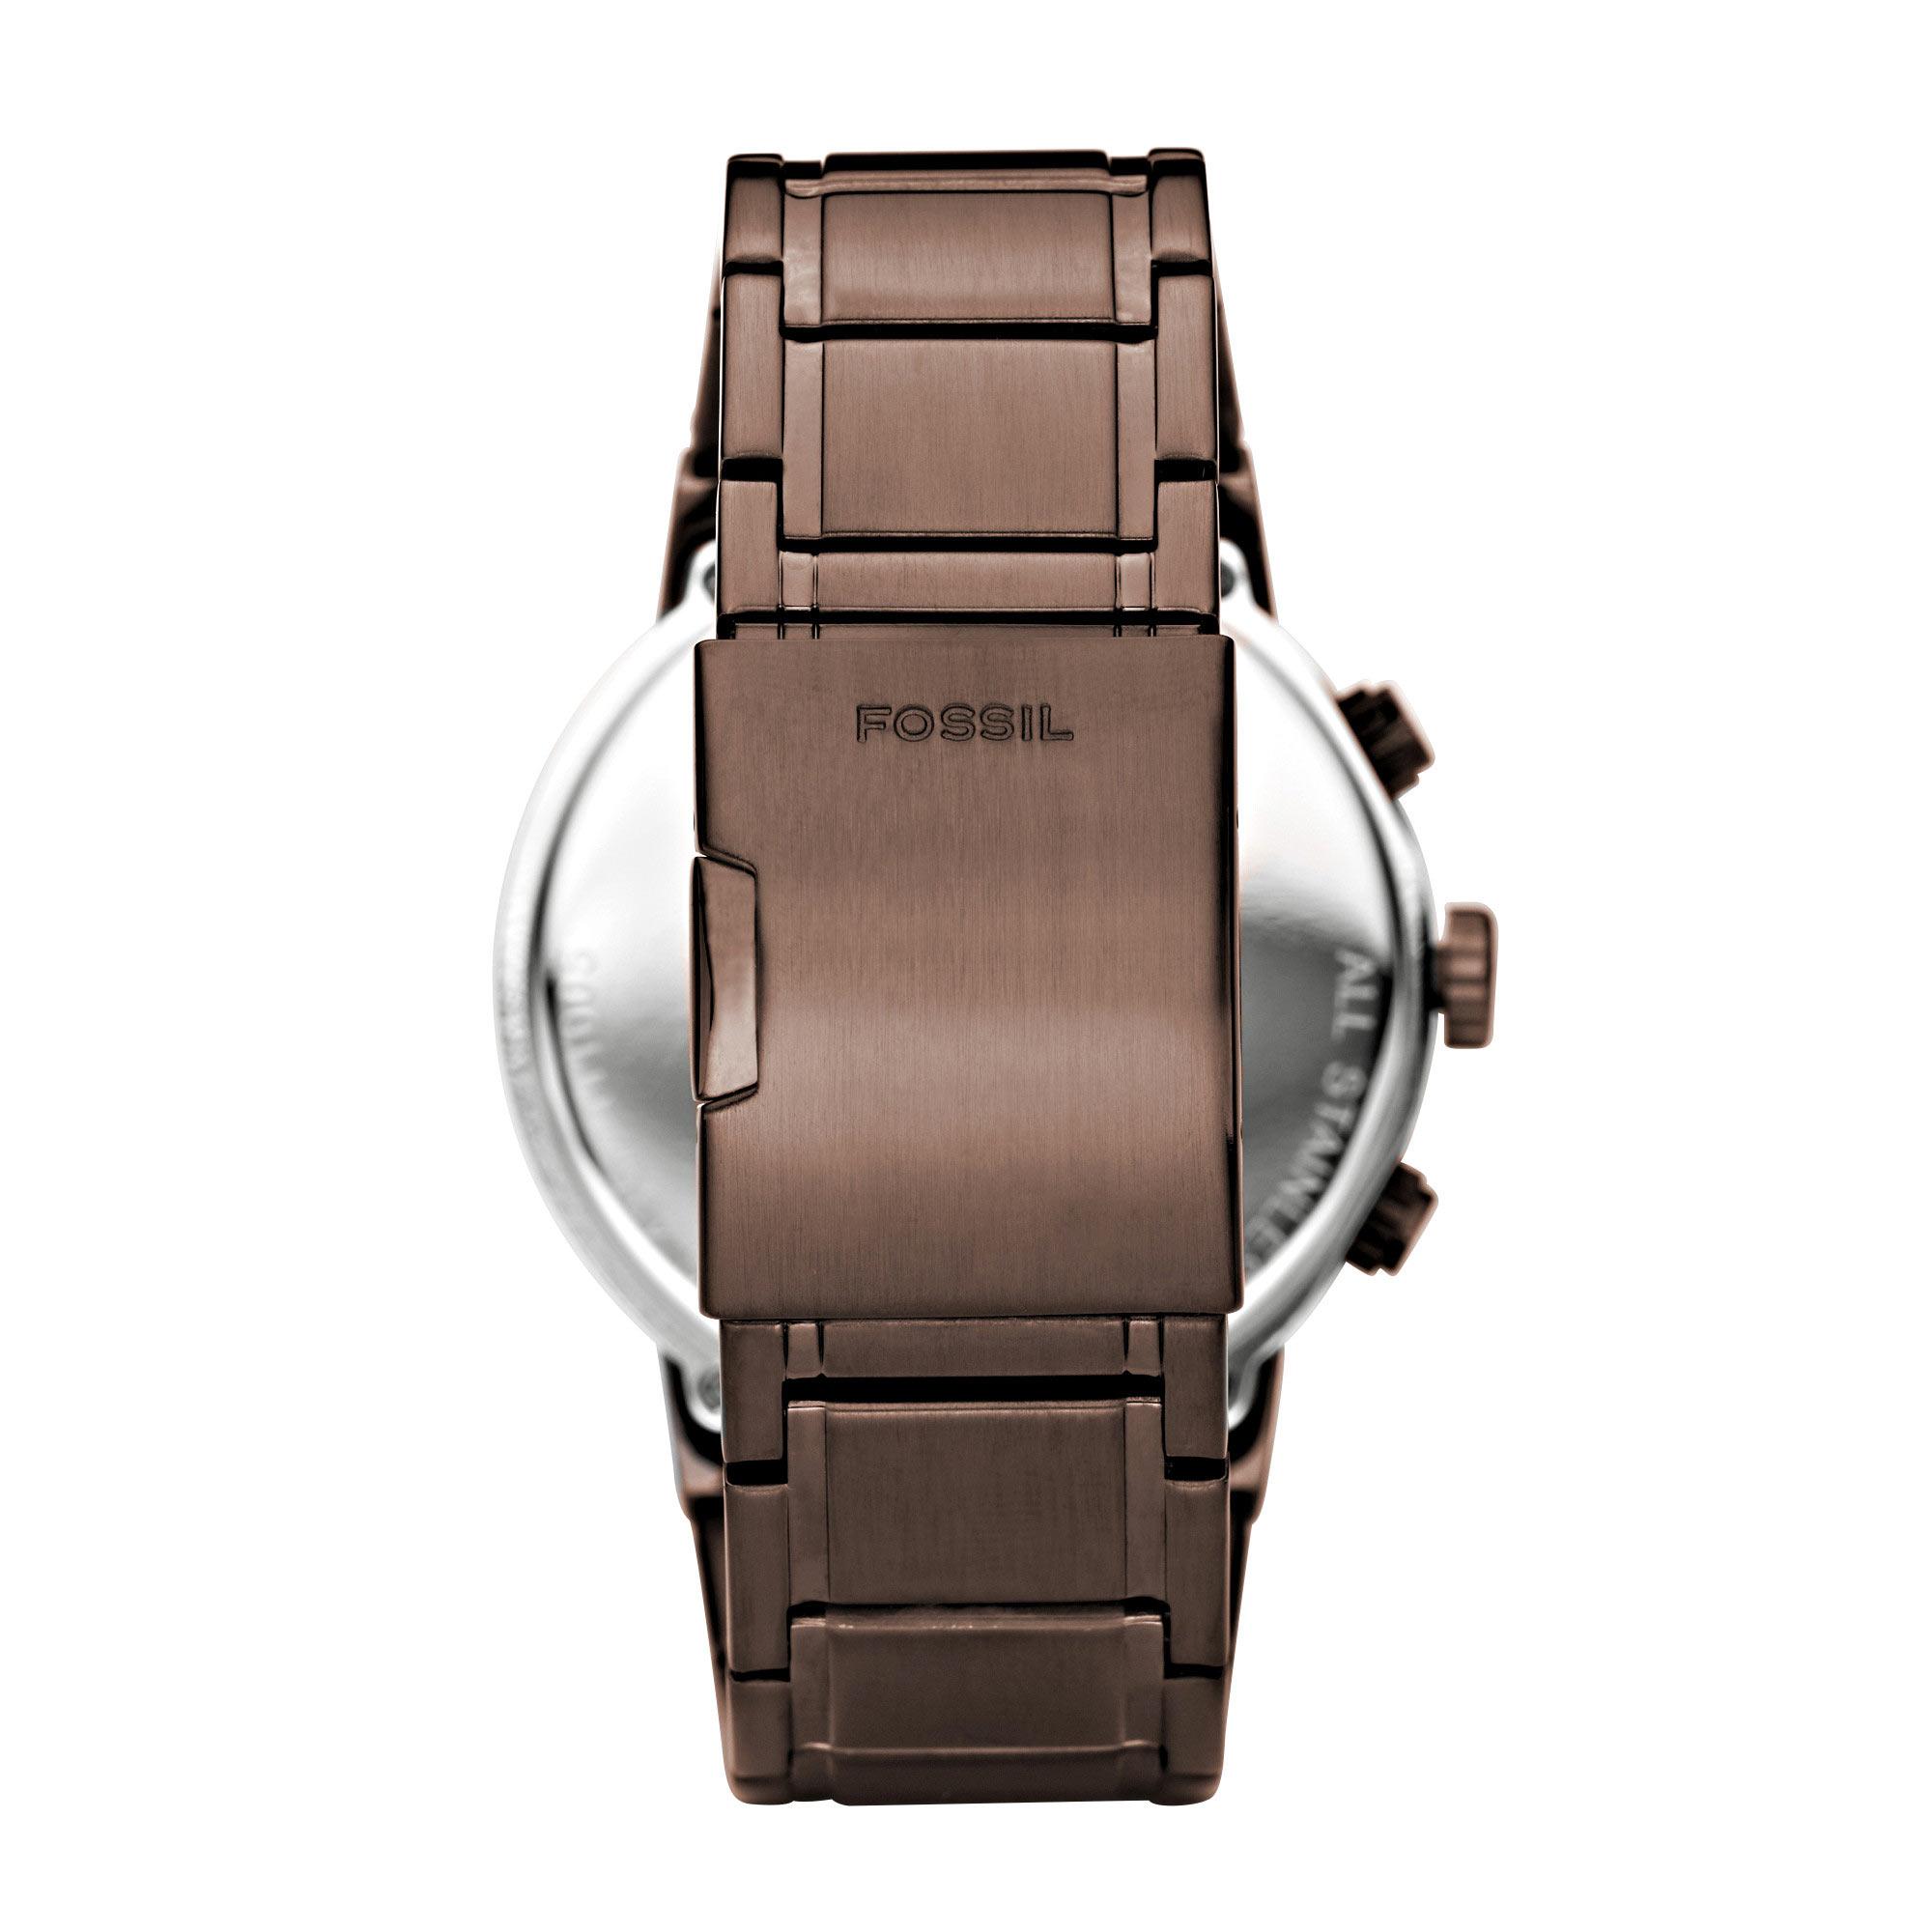 Bracelet fossil homme acier prix